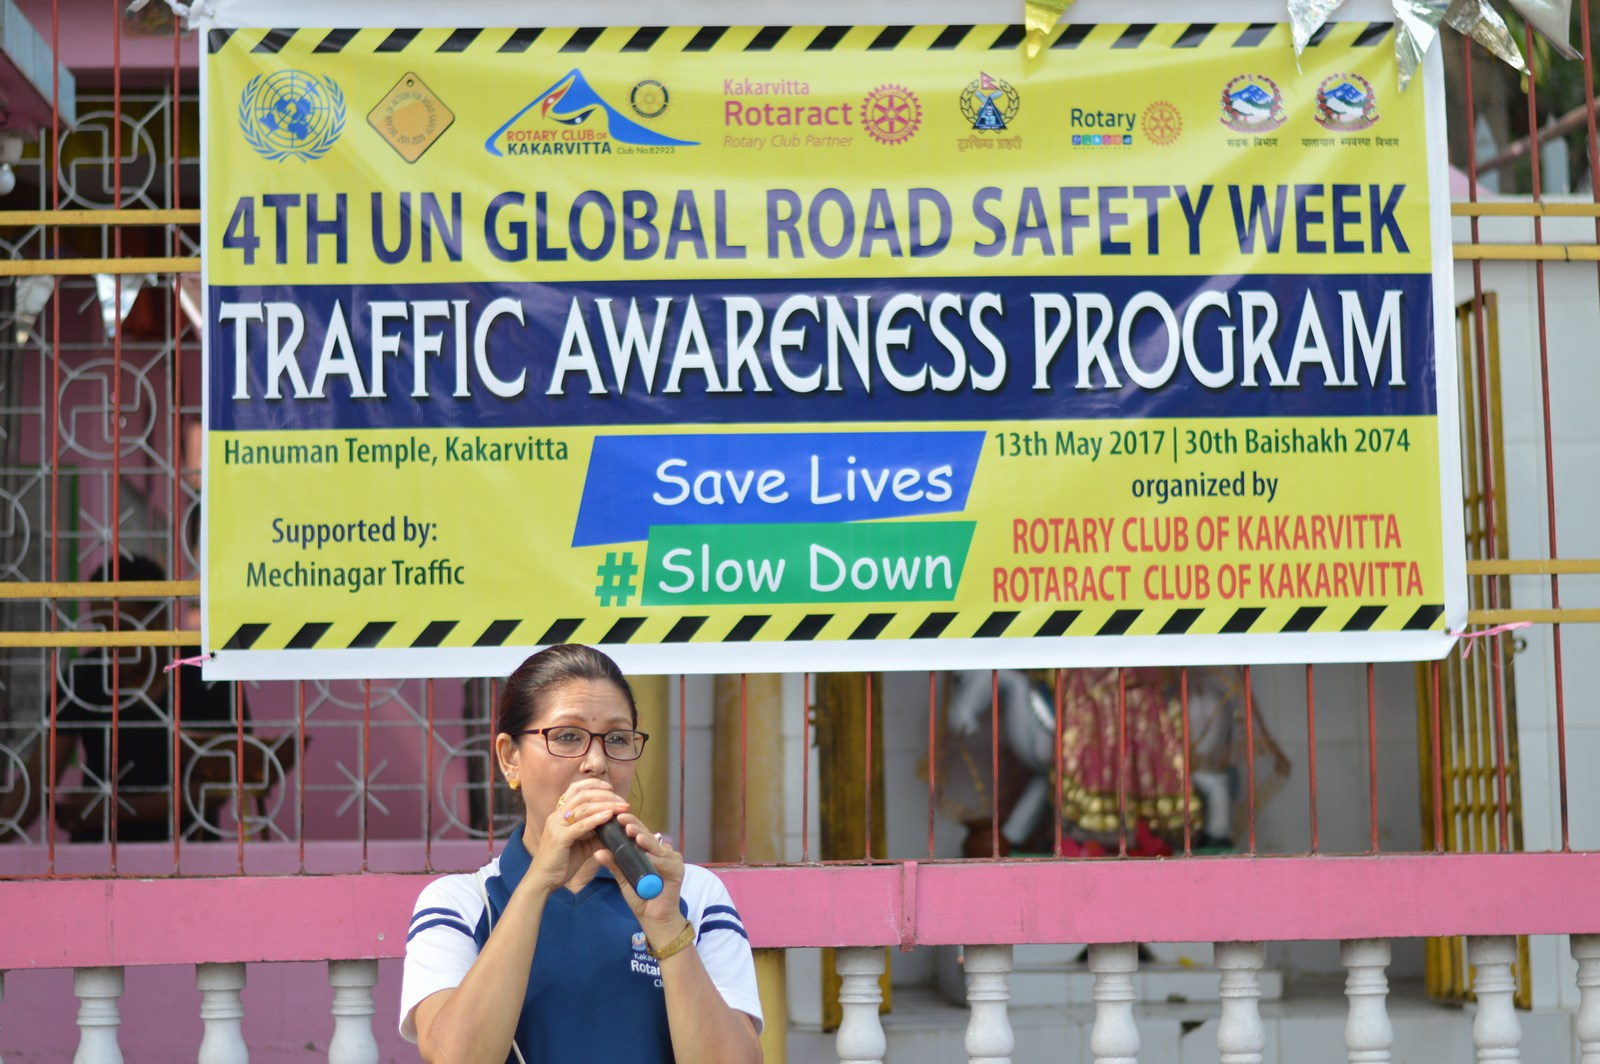 4th-UN-Global-Road-Safety-Week-2017-Traffic-Awareness-Program-Rotary-club-of-Kakarvitta-33